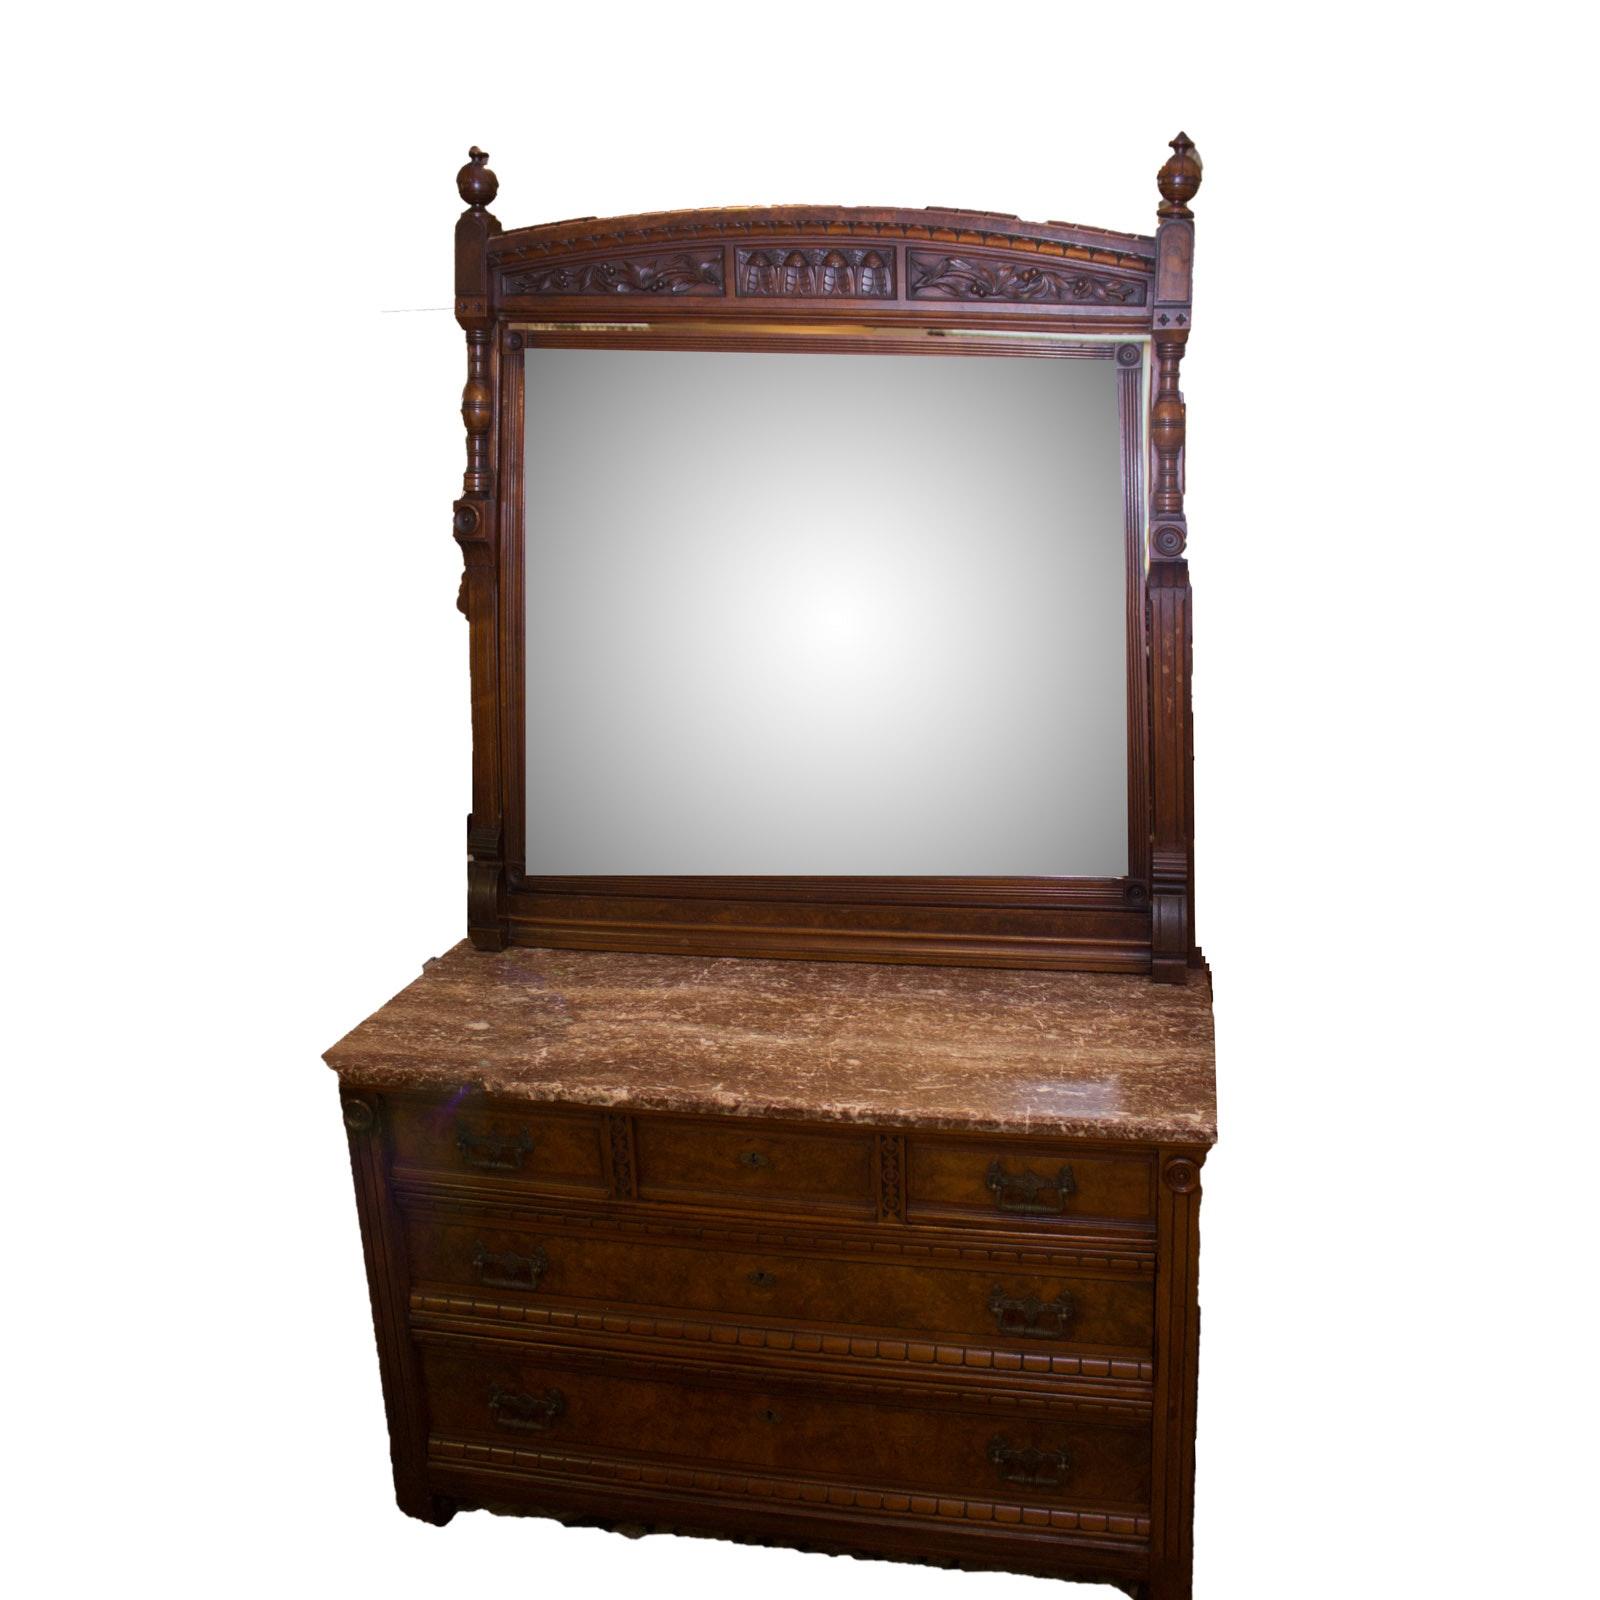 Antique To Vintage Marble Top Eastlake Dresser With Mirror